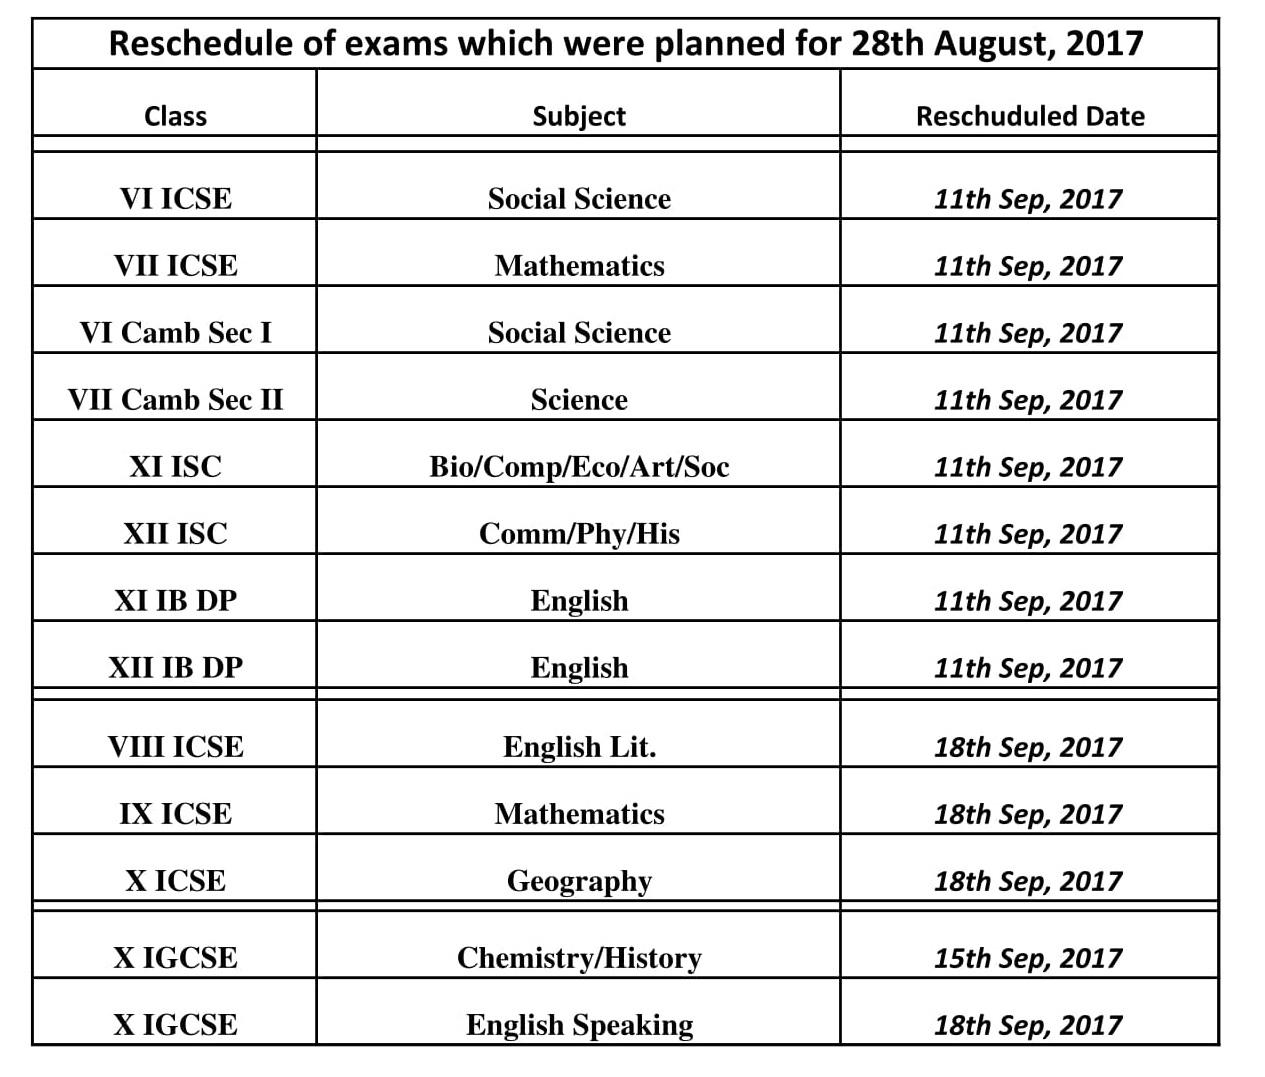 Reschedule of 28th August Exam